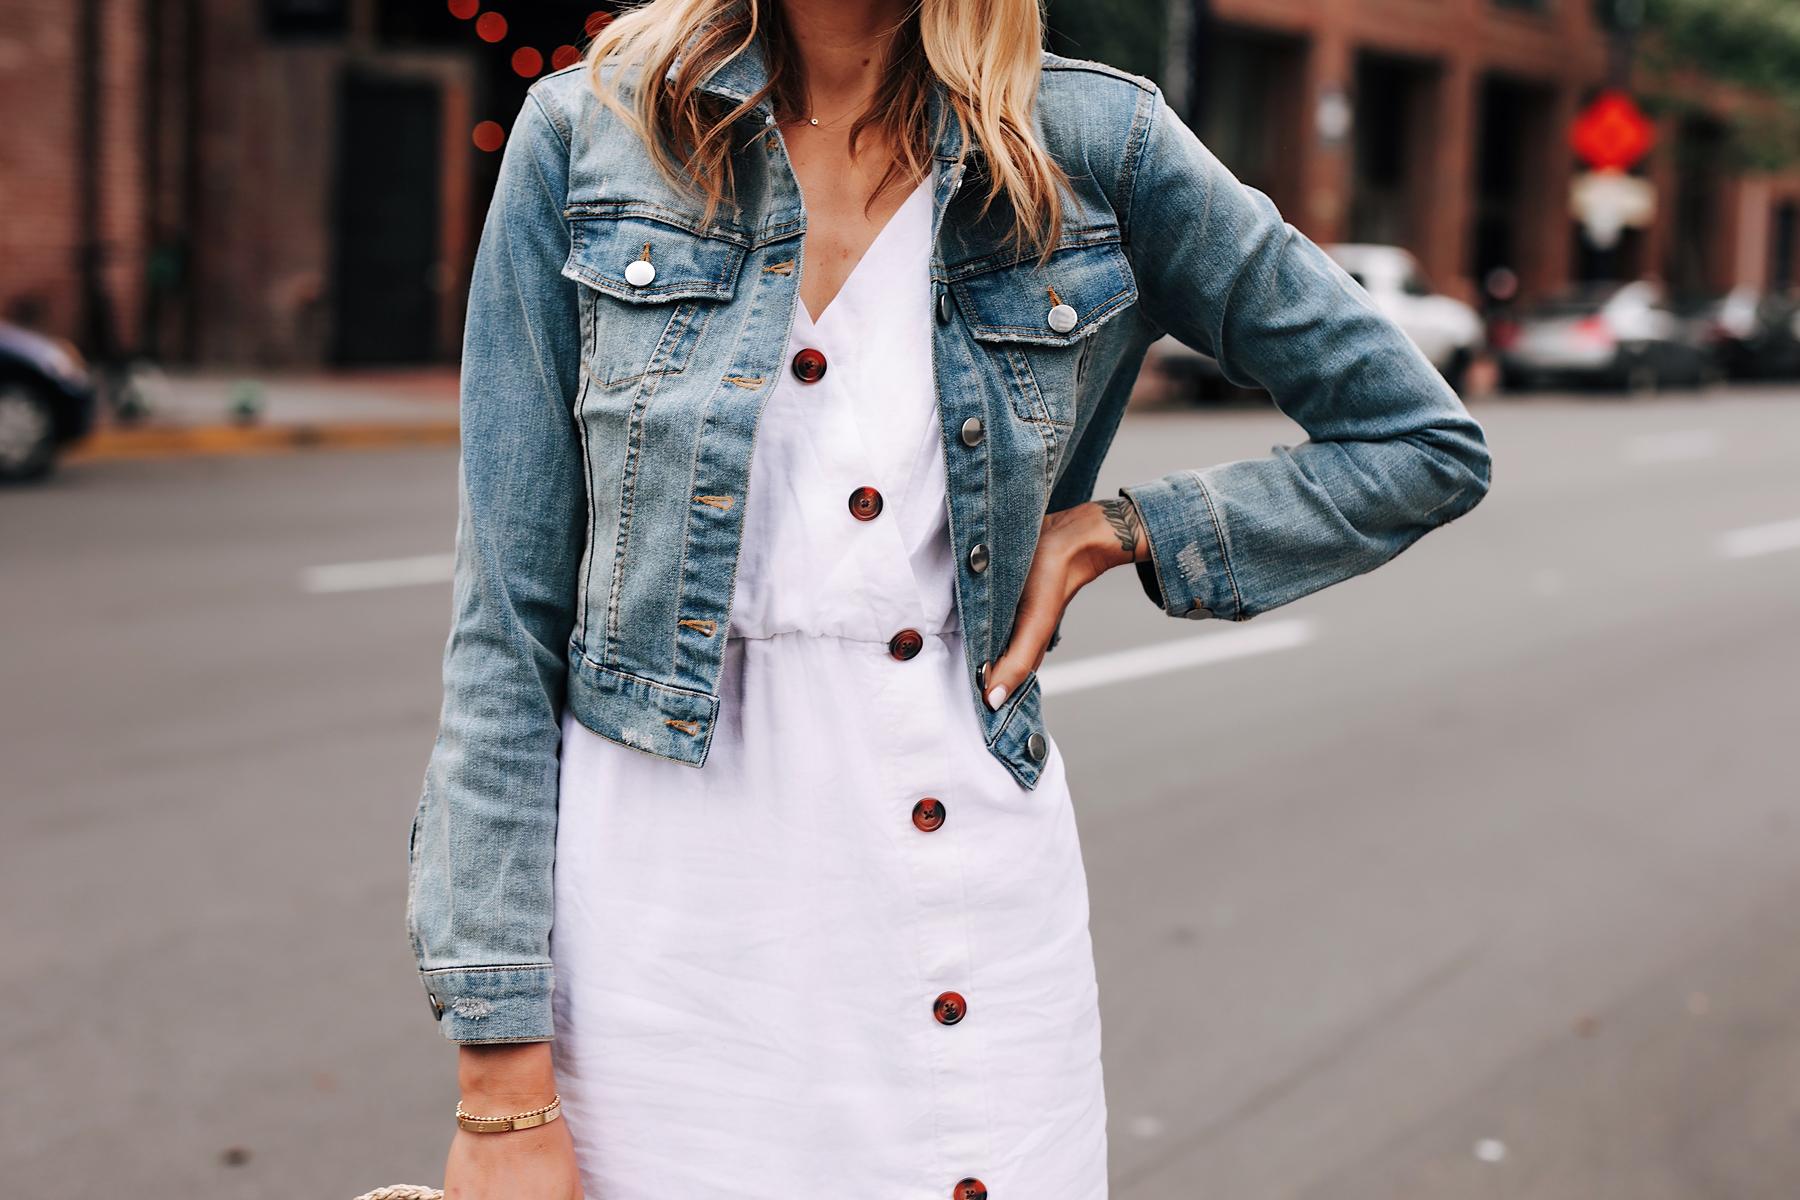 Blonde Woman Wearing Denim Jacket White Button Dress Fashion Jackson San Diego Fashion Blogger Street Style